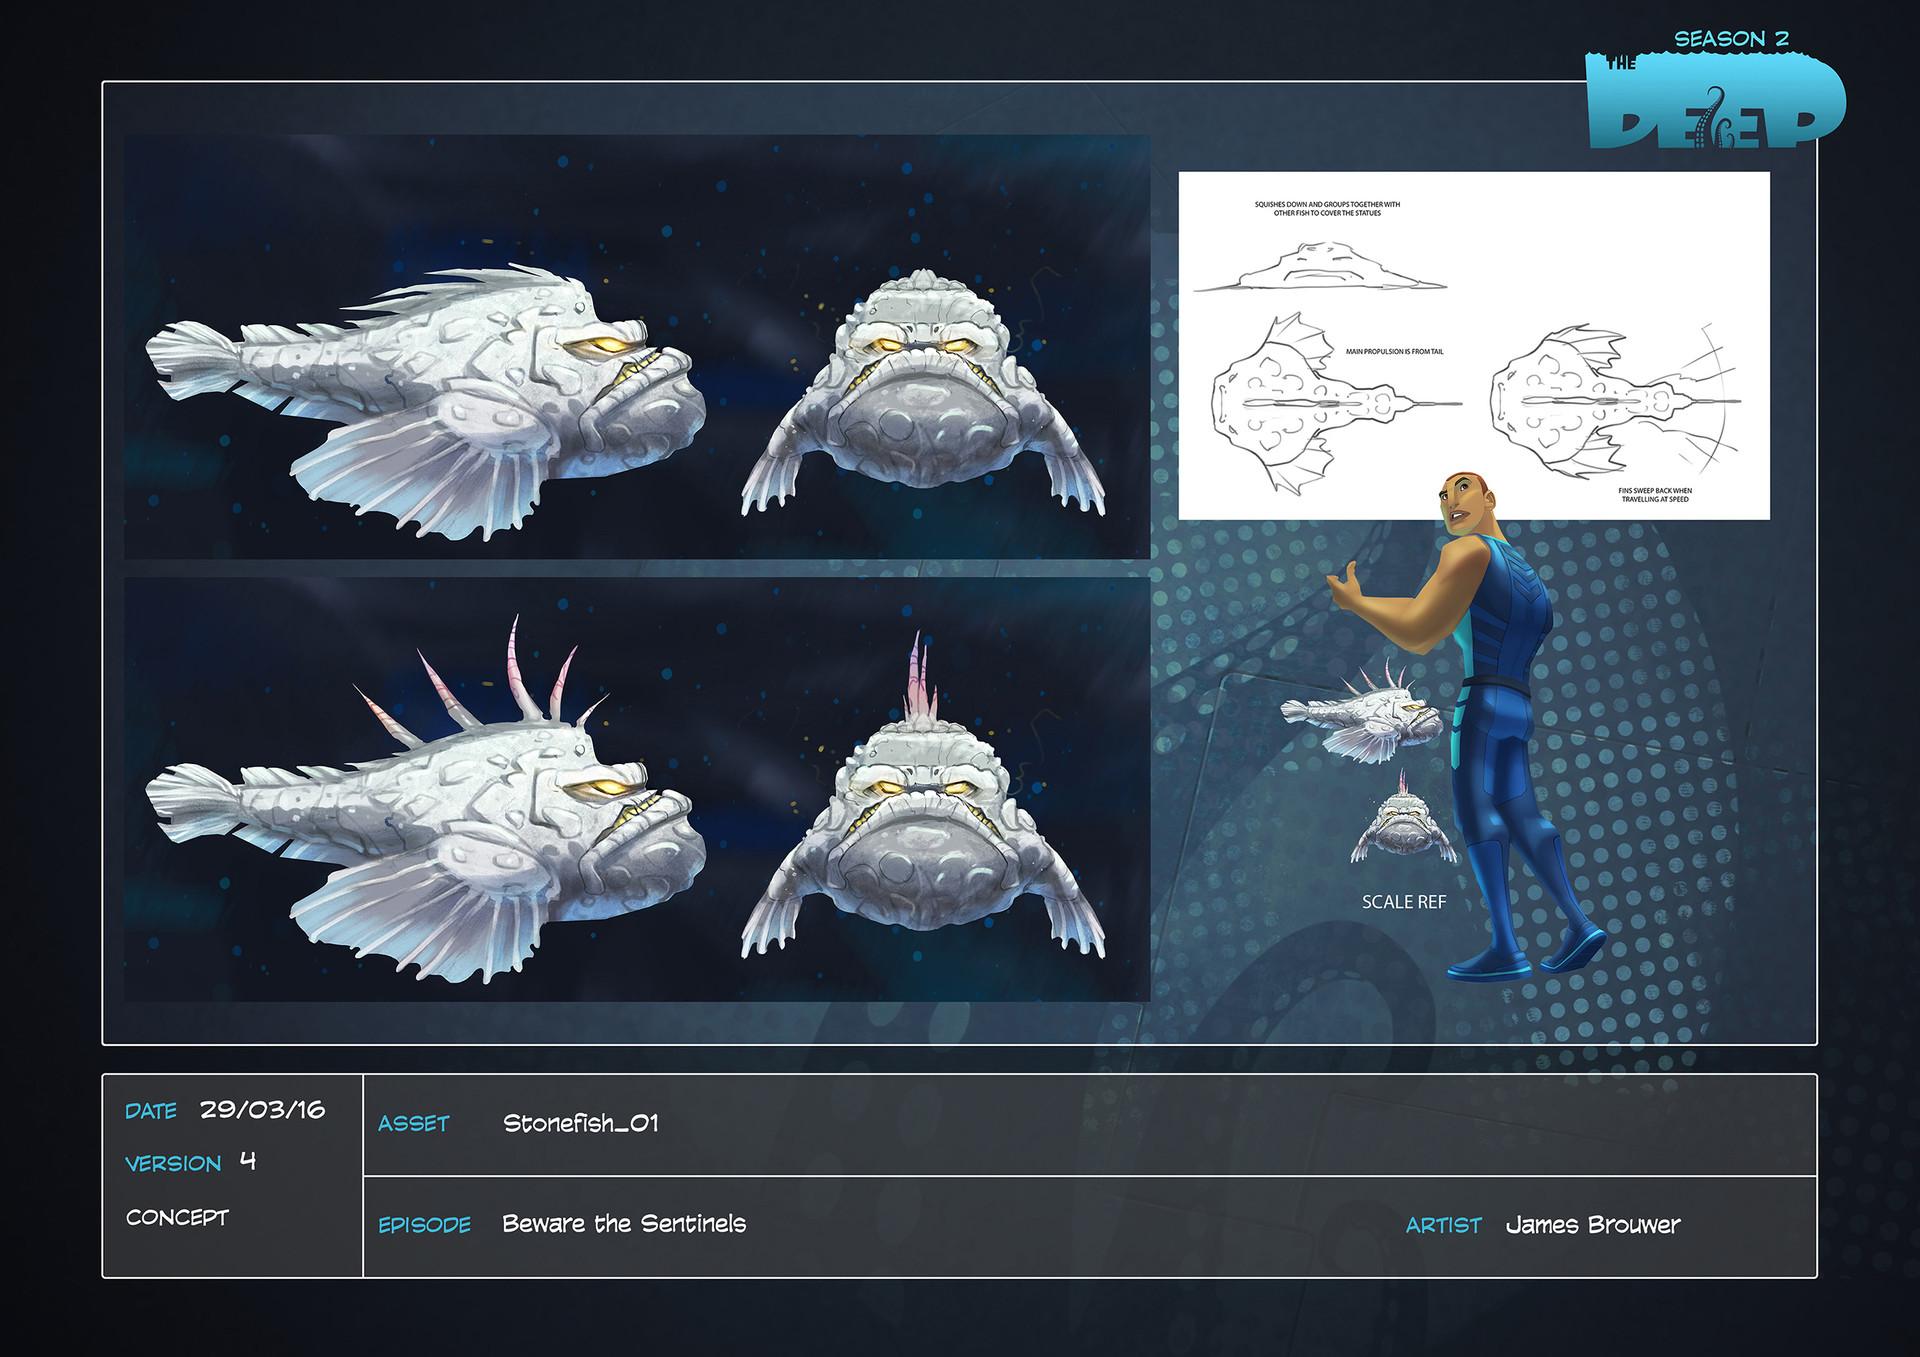 James brouwer stonefish 01 design v004